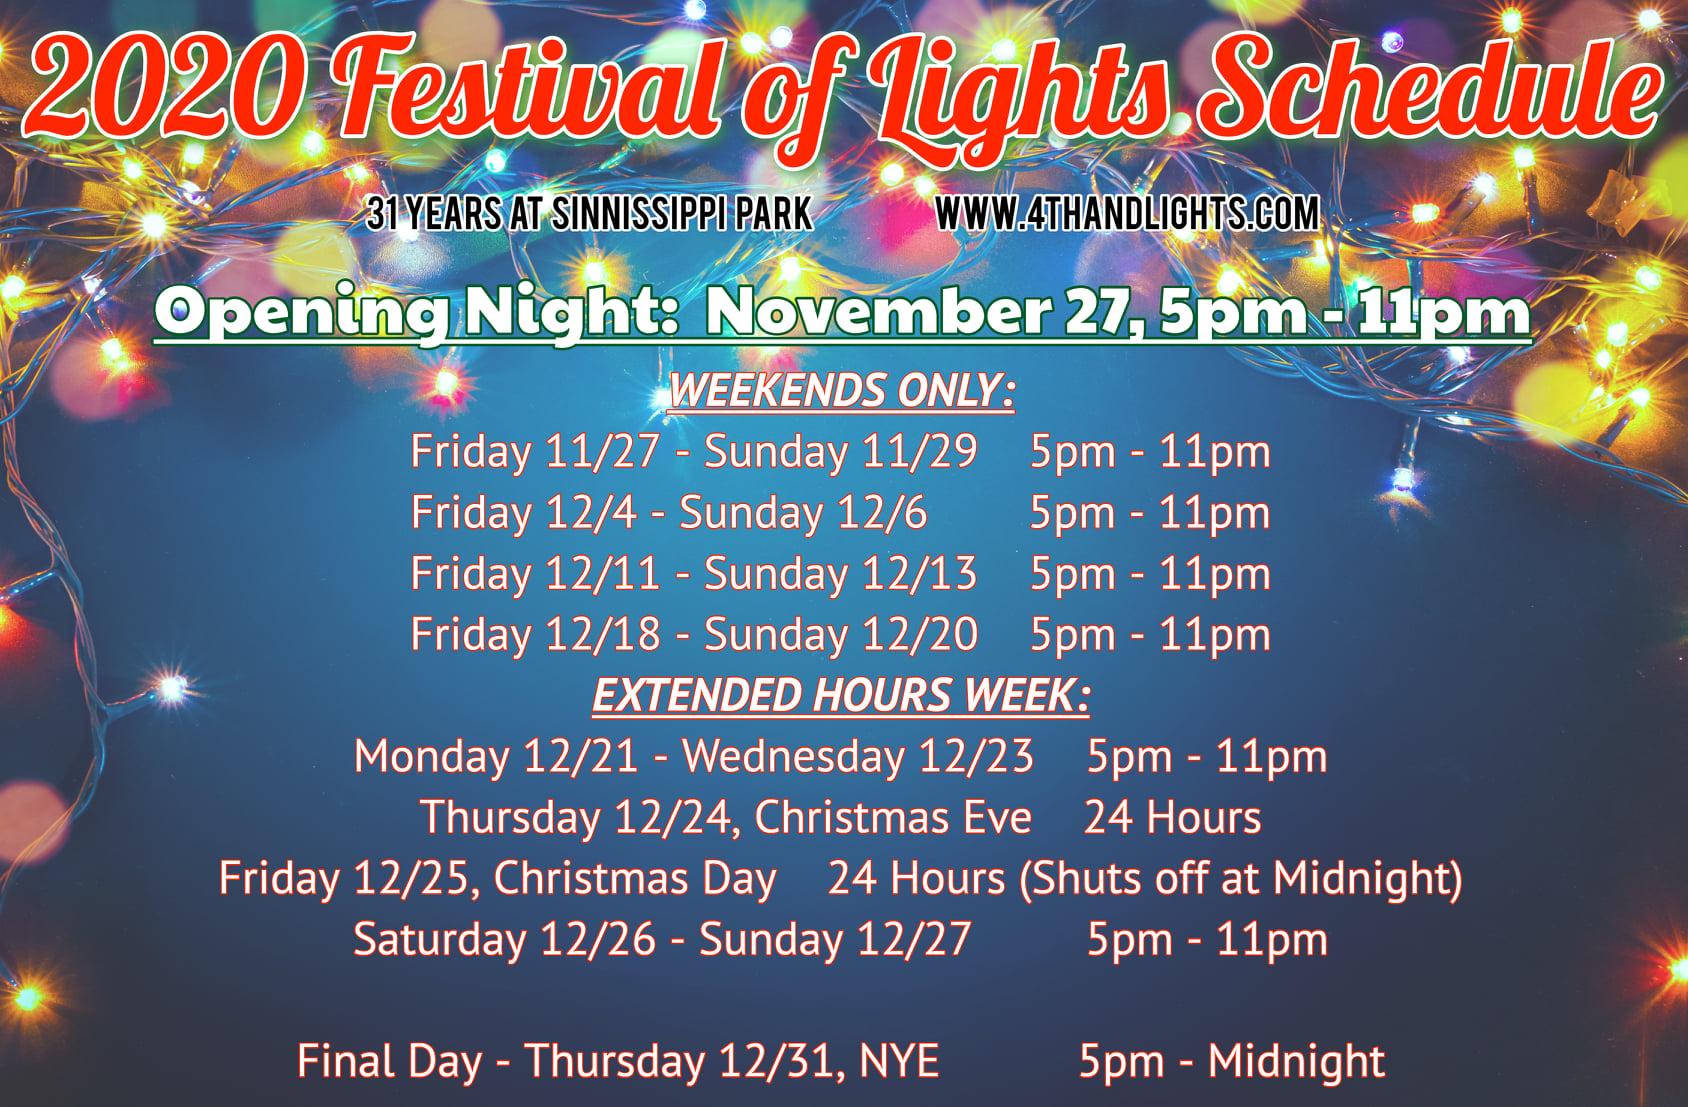 2020 Christmas Rockford, Il 2020 Festival of Lights